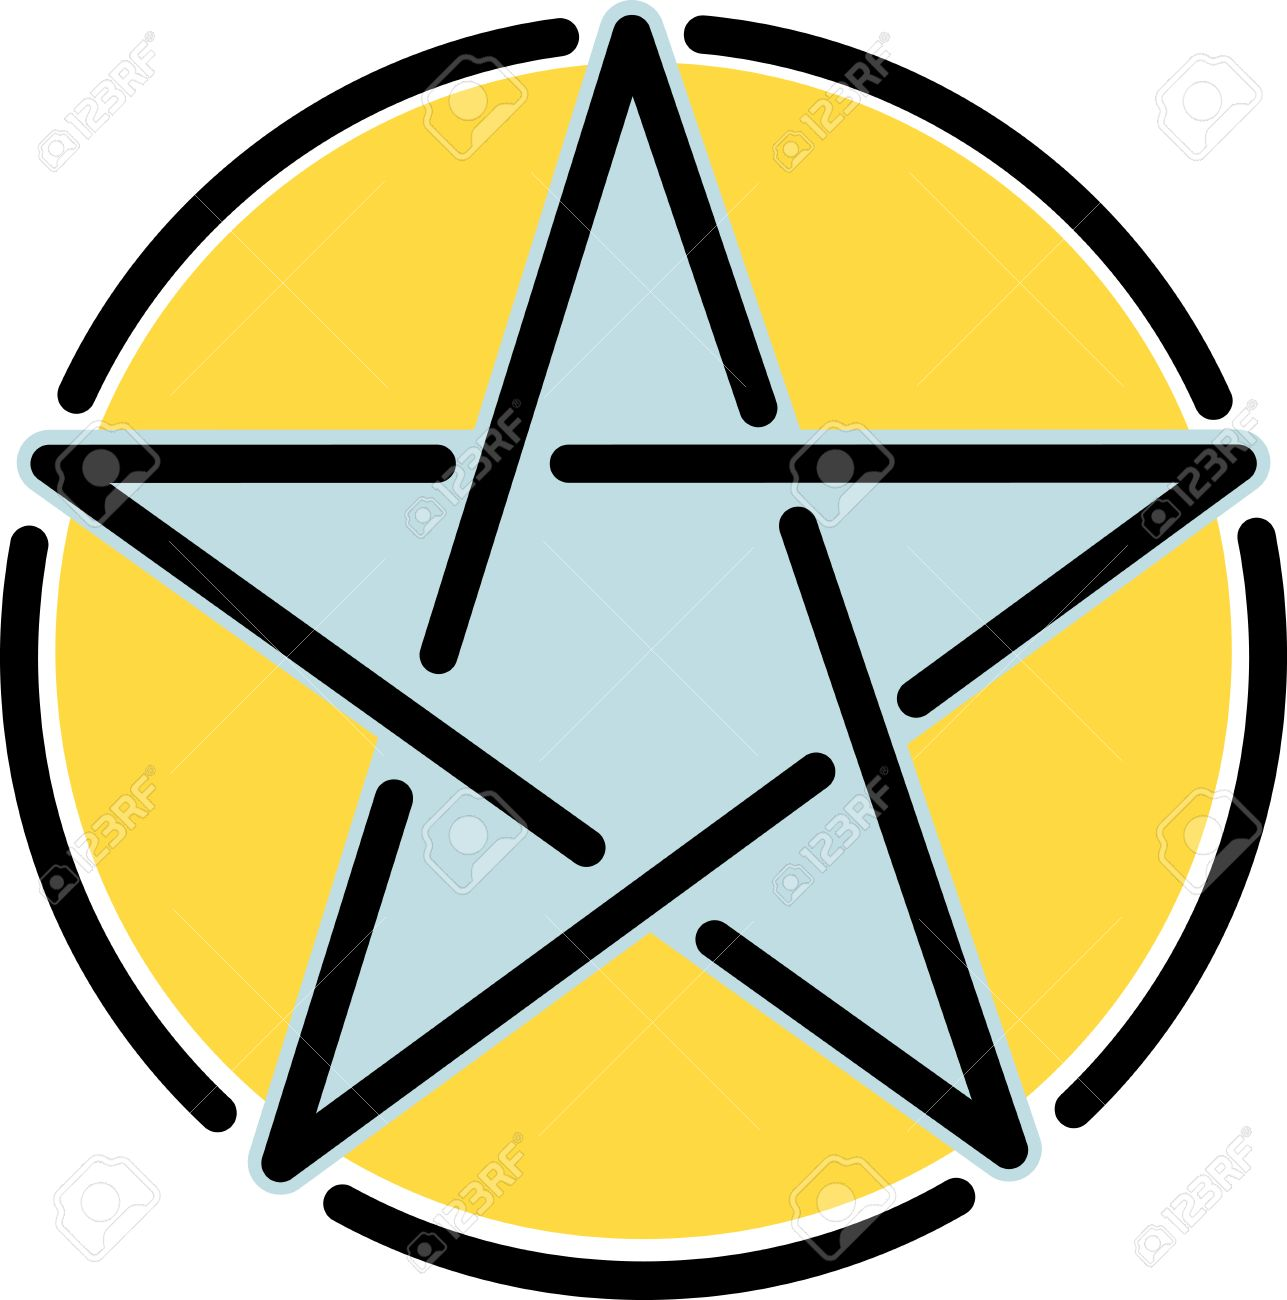 Wicca pagan witch religious symbol logo icon star wicca pagan witch religious symbol logo icon star biocorpaavc Choice Image